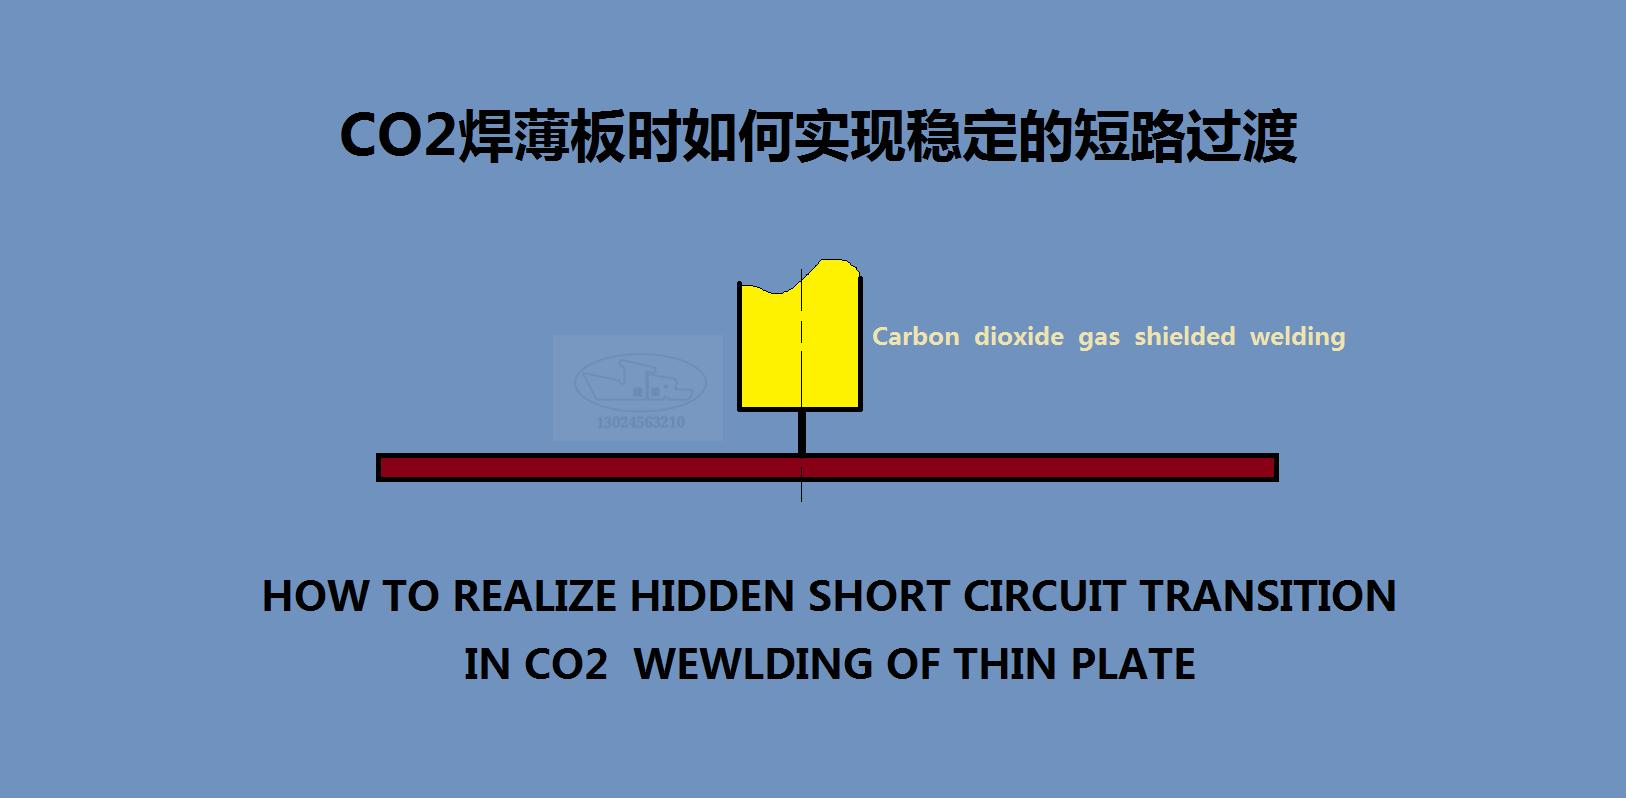 CO2焊薄板时如何实现稳定的短路过渡焊接